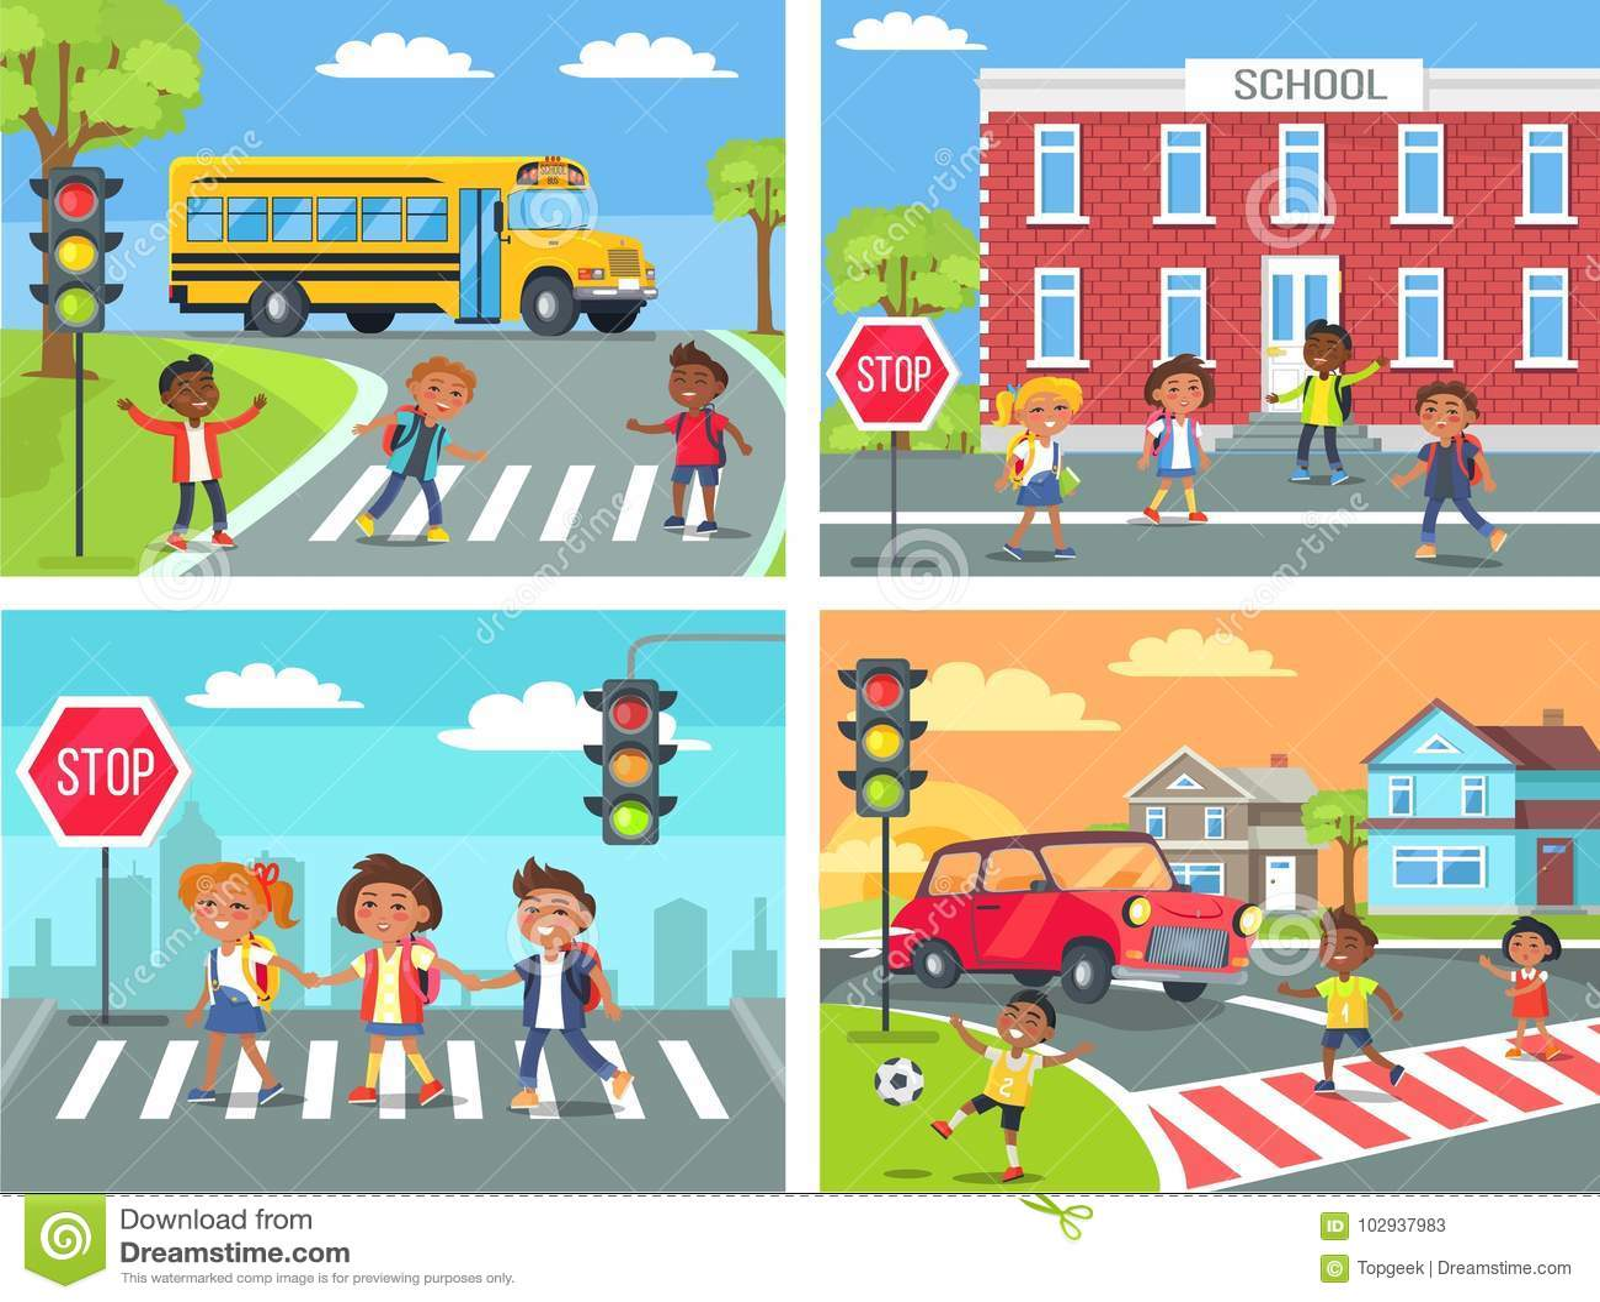 Schoolchildren Cross Road On Pedestrian Crossing Stock